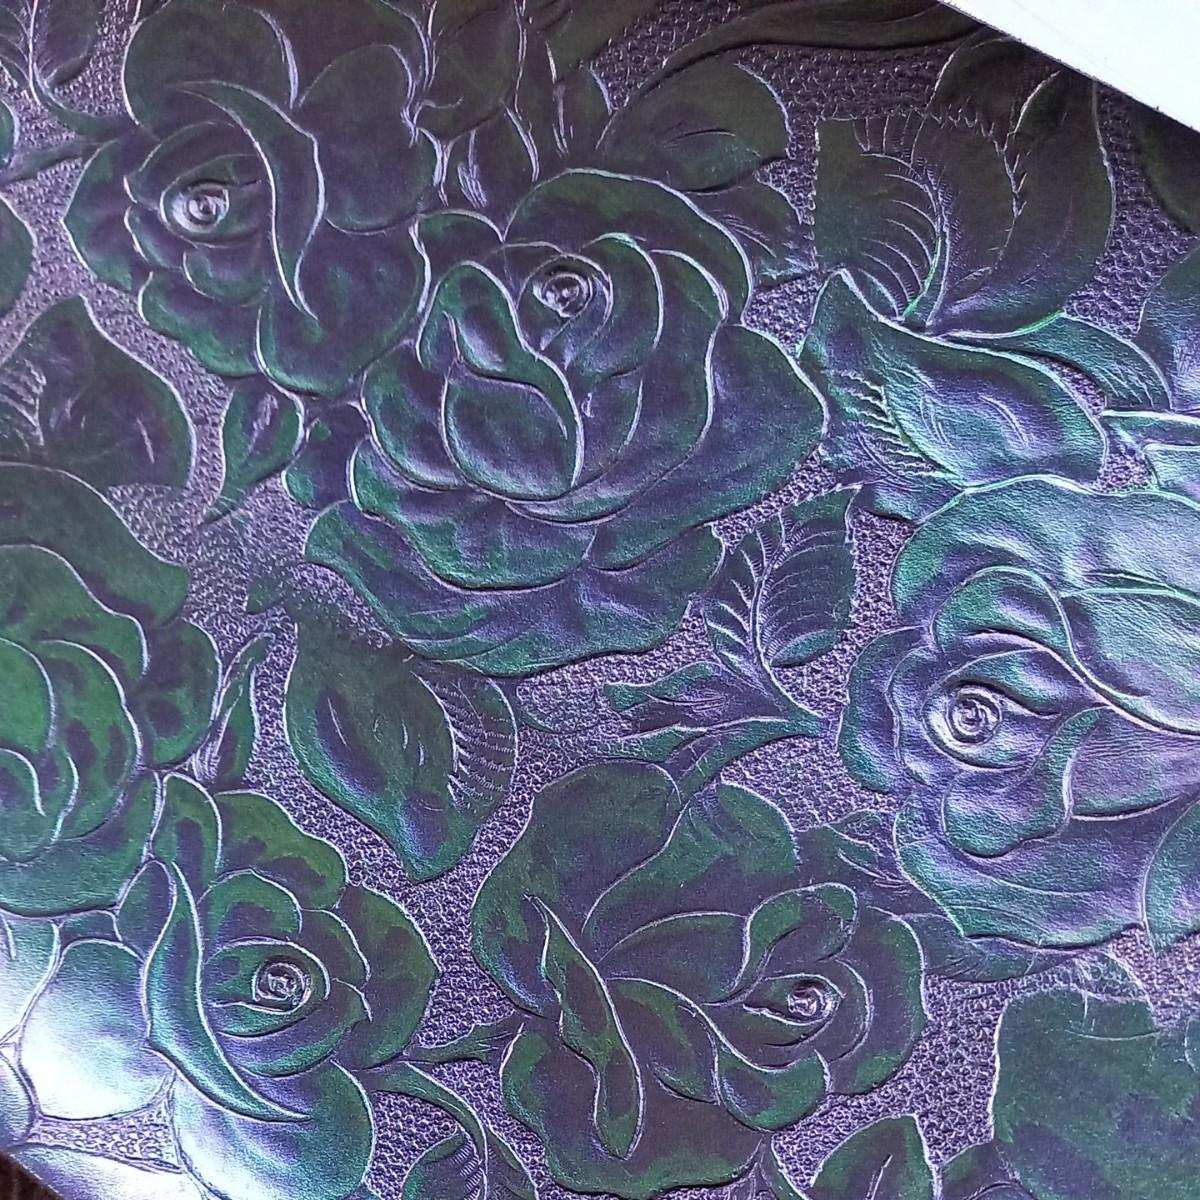 sale革ハギレ 薔薇型押し パールネイビーグリーン レザークラフト